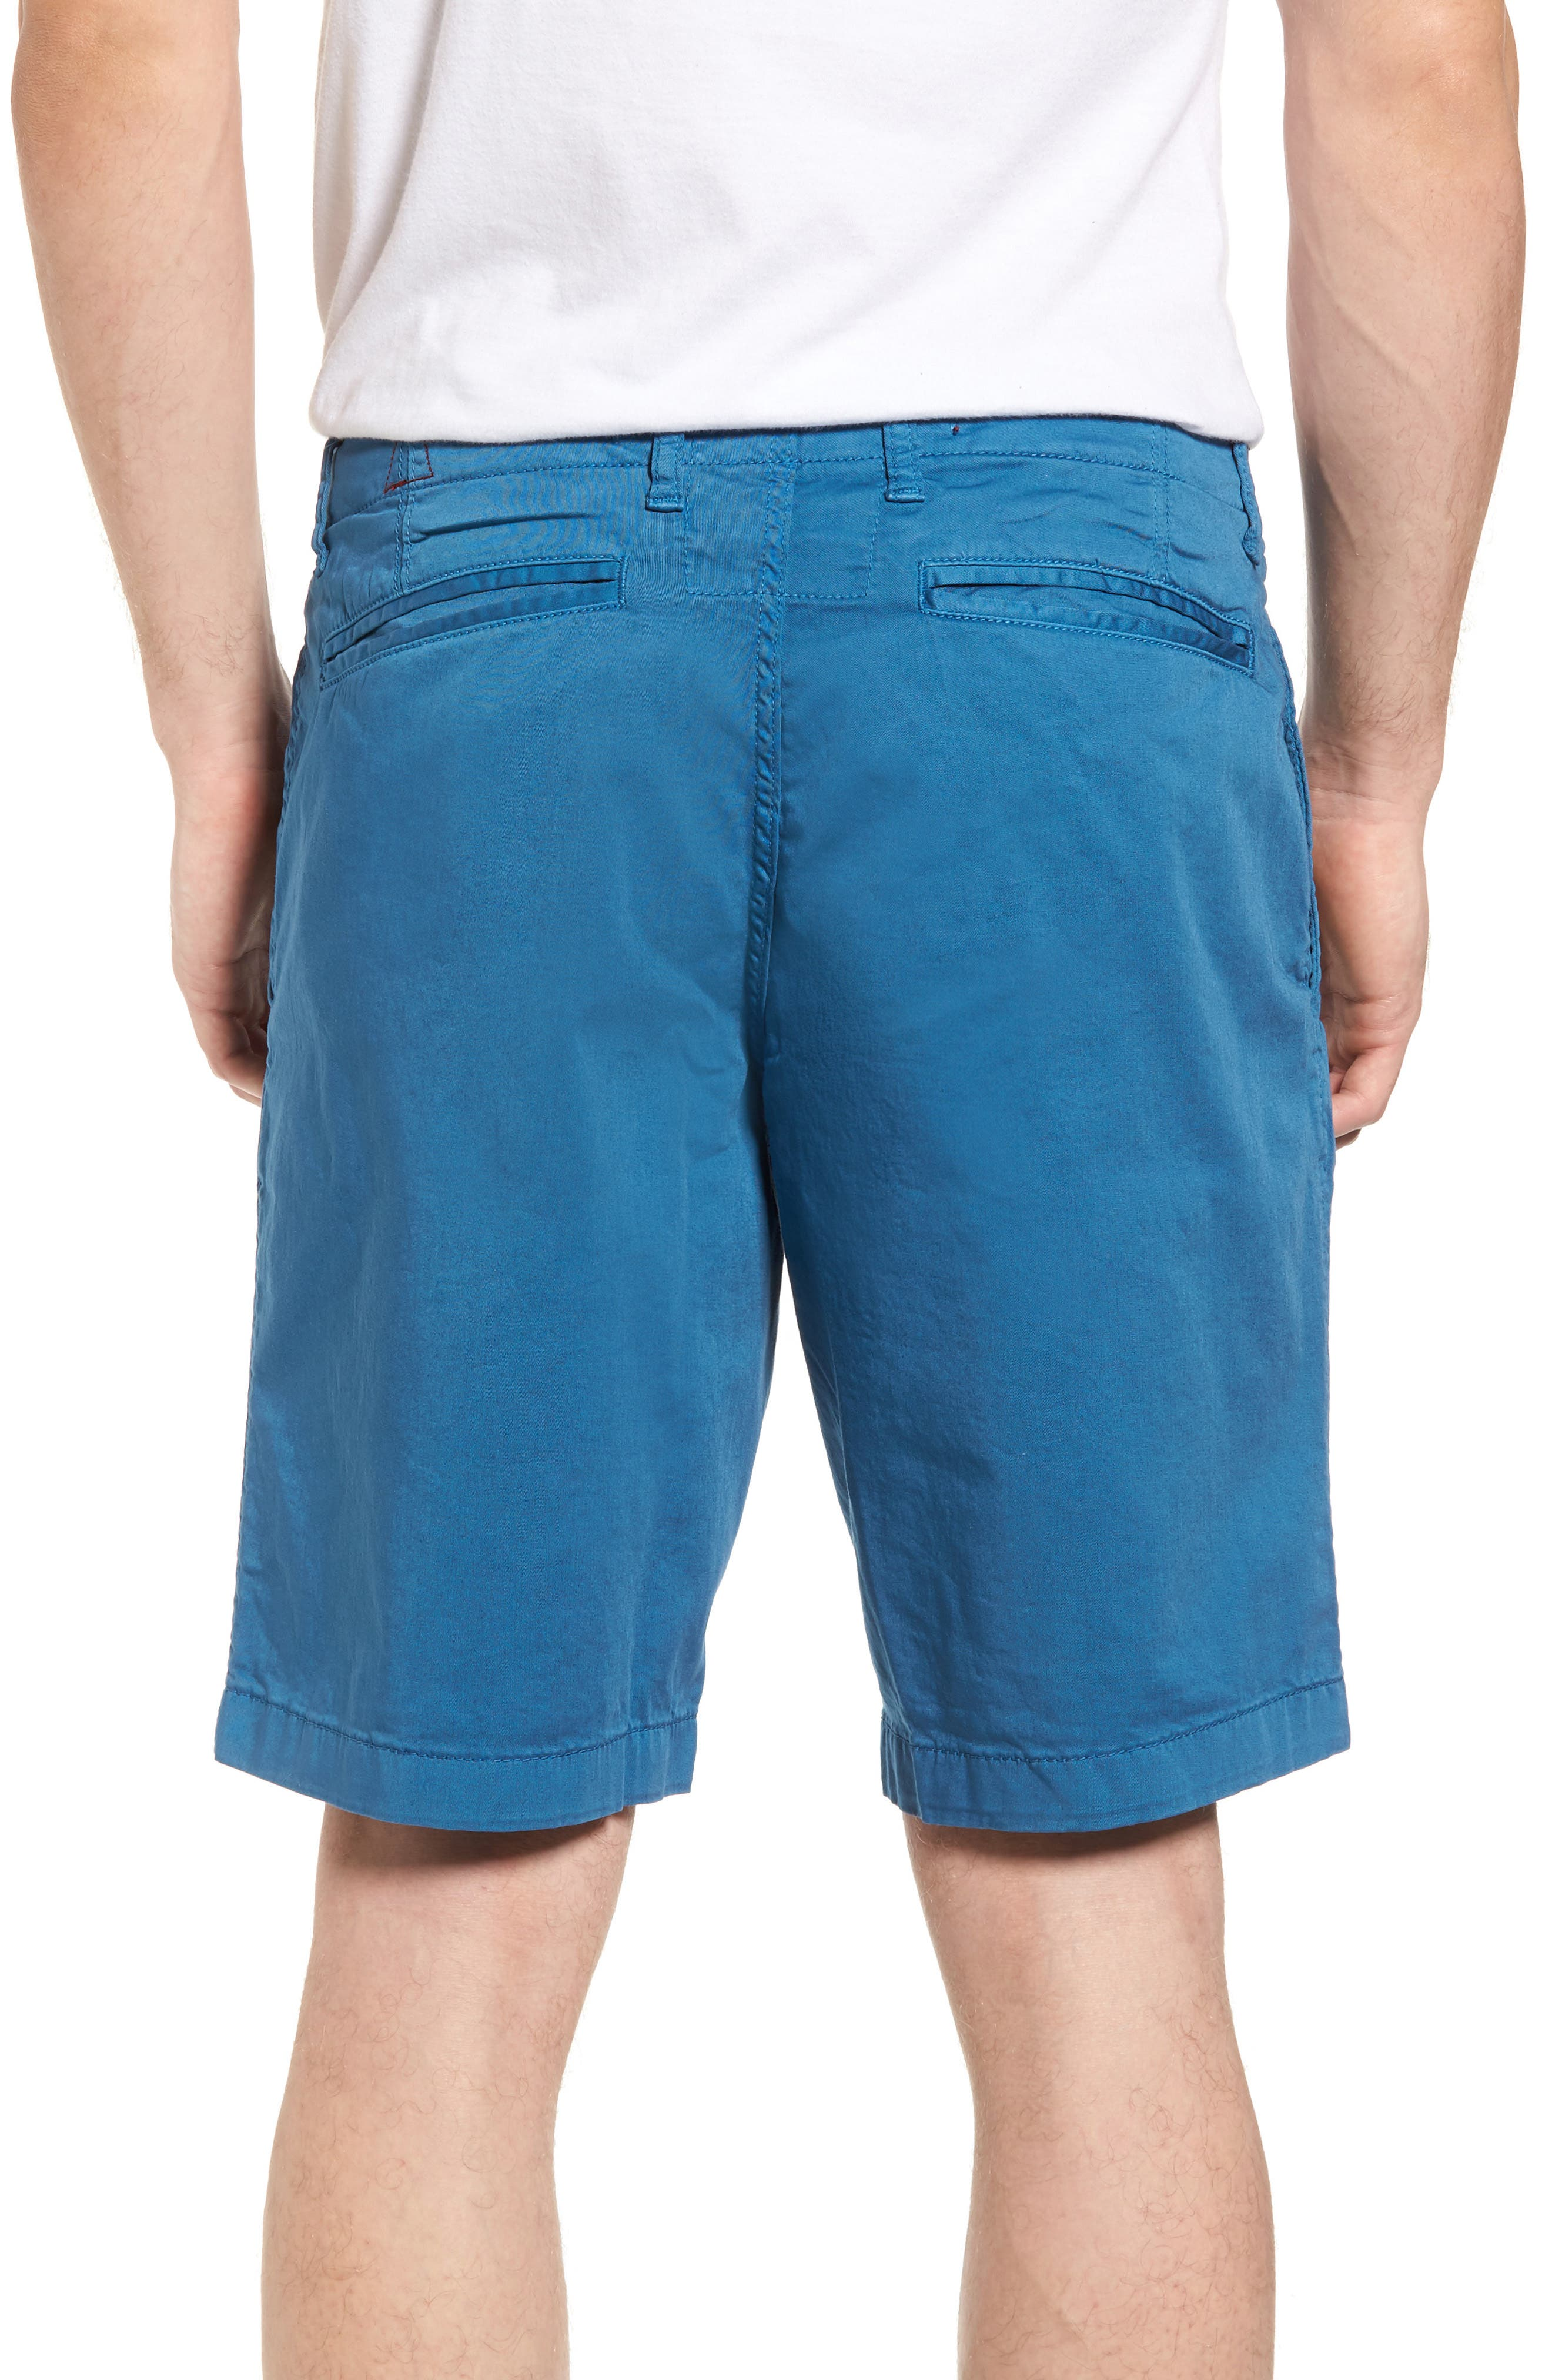 St. Barts Twill Shorts,                             Alternate thumbnail 22, color,